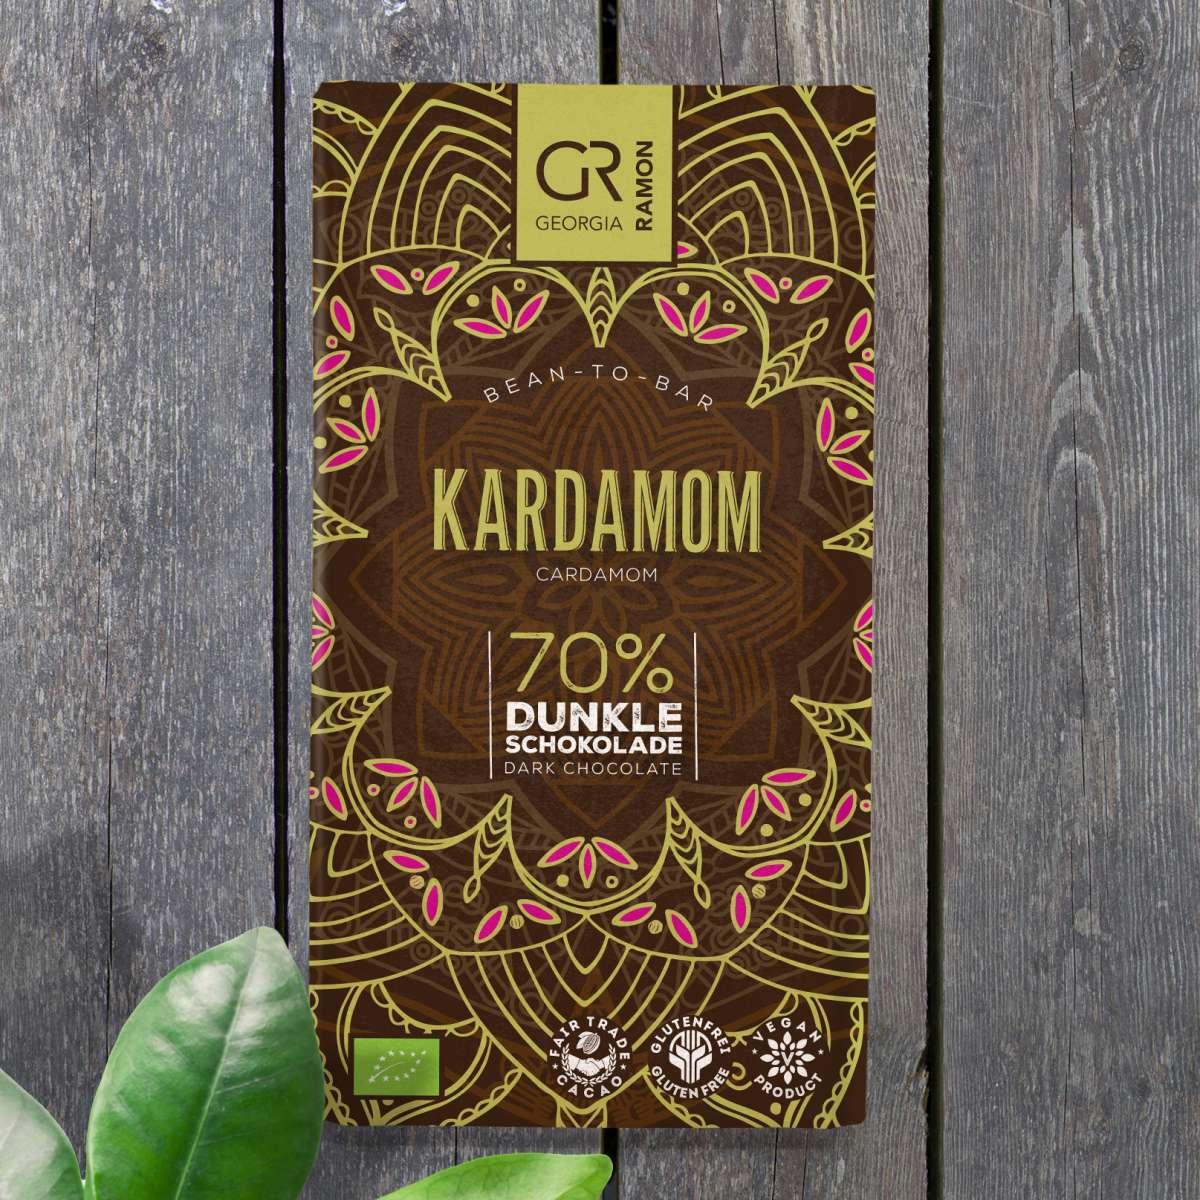 GEORGIA RAMON | Dunkle Schokolade Kardamom 70% | BIO